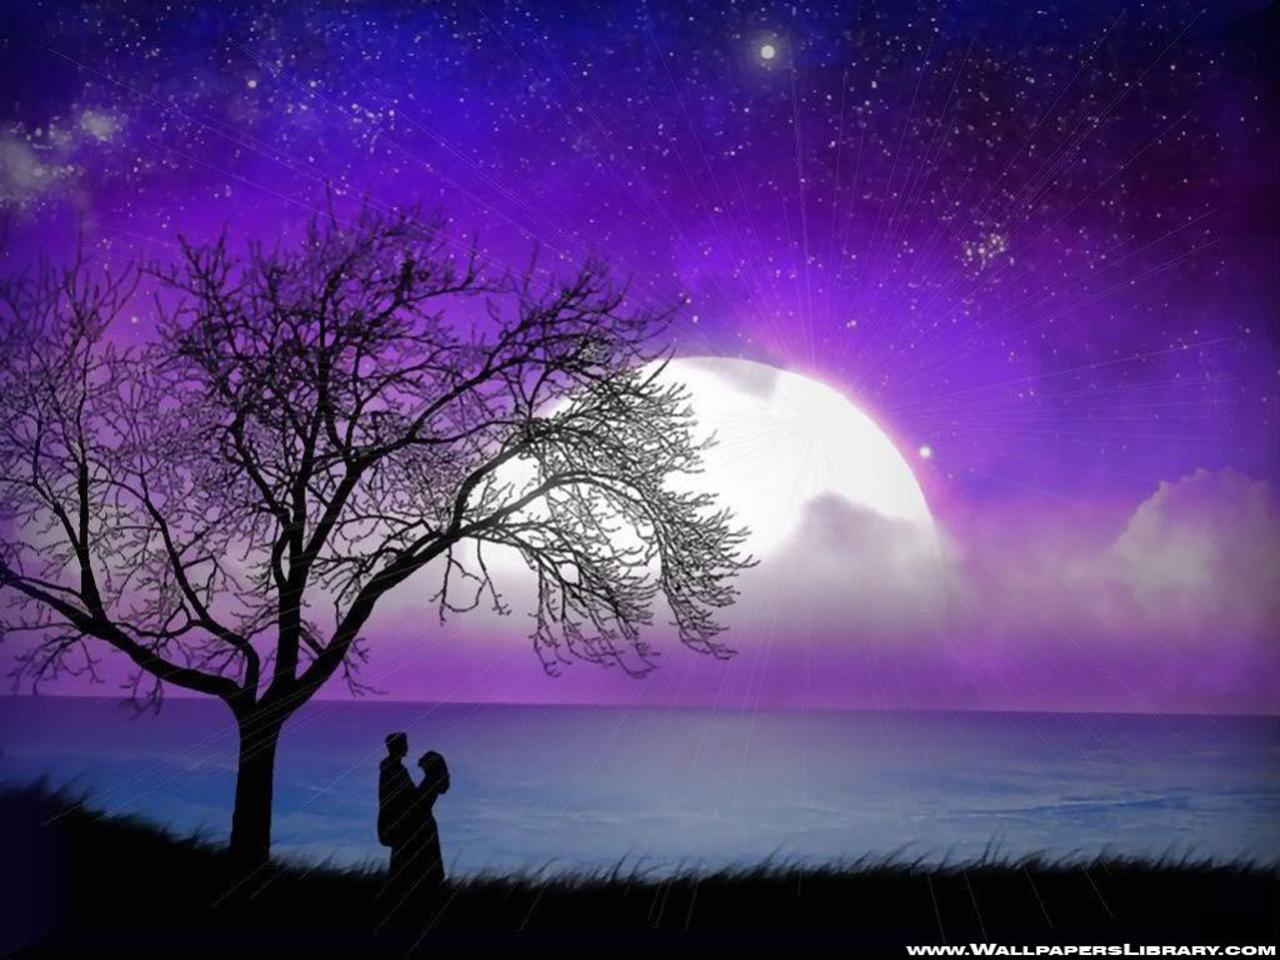 Most Inspiring Wallpaper Love Scenery - romantic-moonlight-wallpaper-large-10  2018_968077.jpg?ssl\u003d1